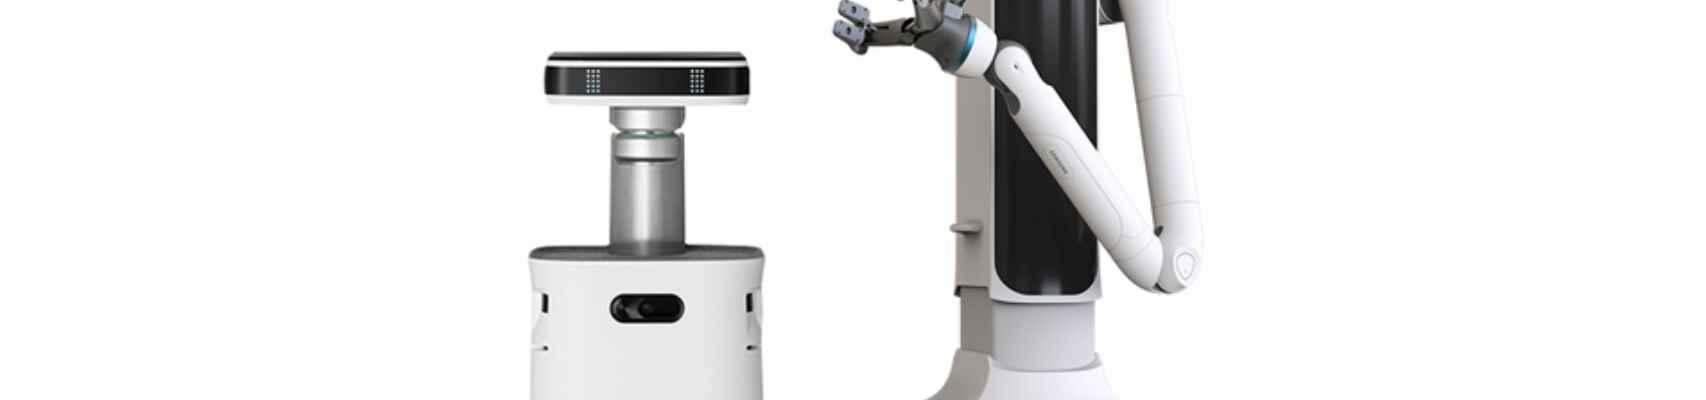 ces 2021 samsung bot handy bot care